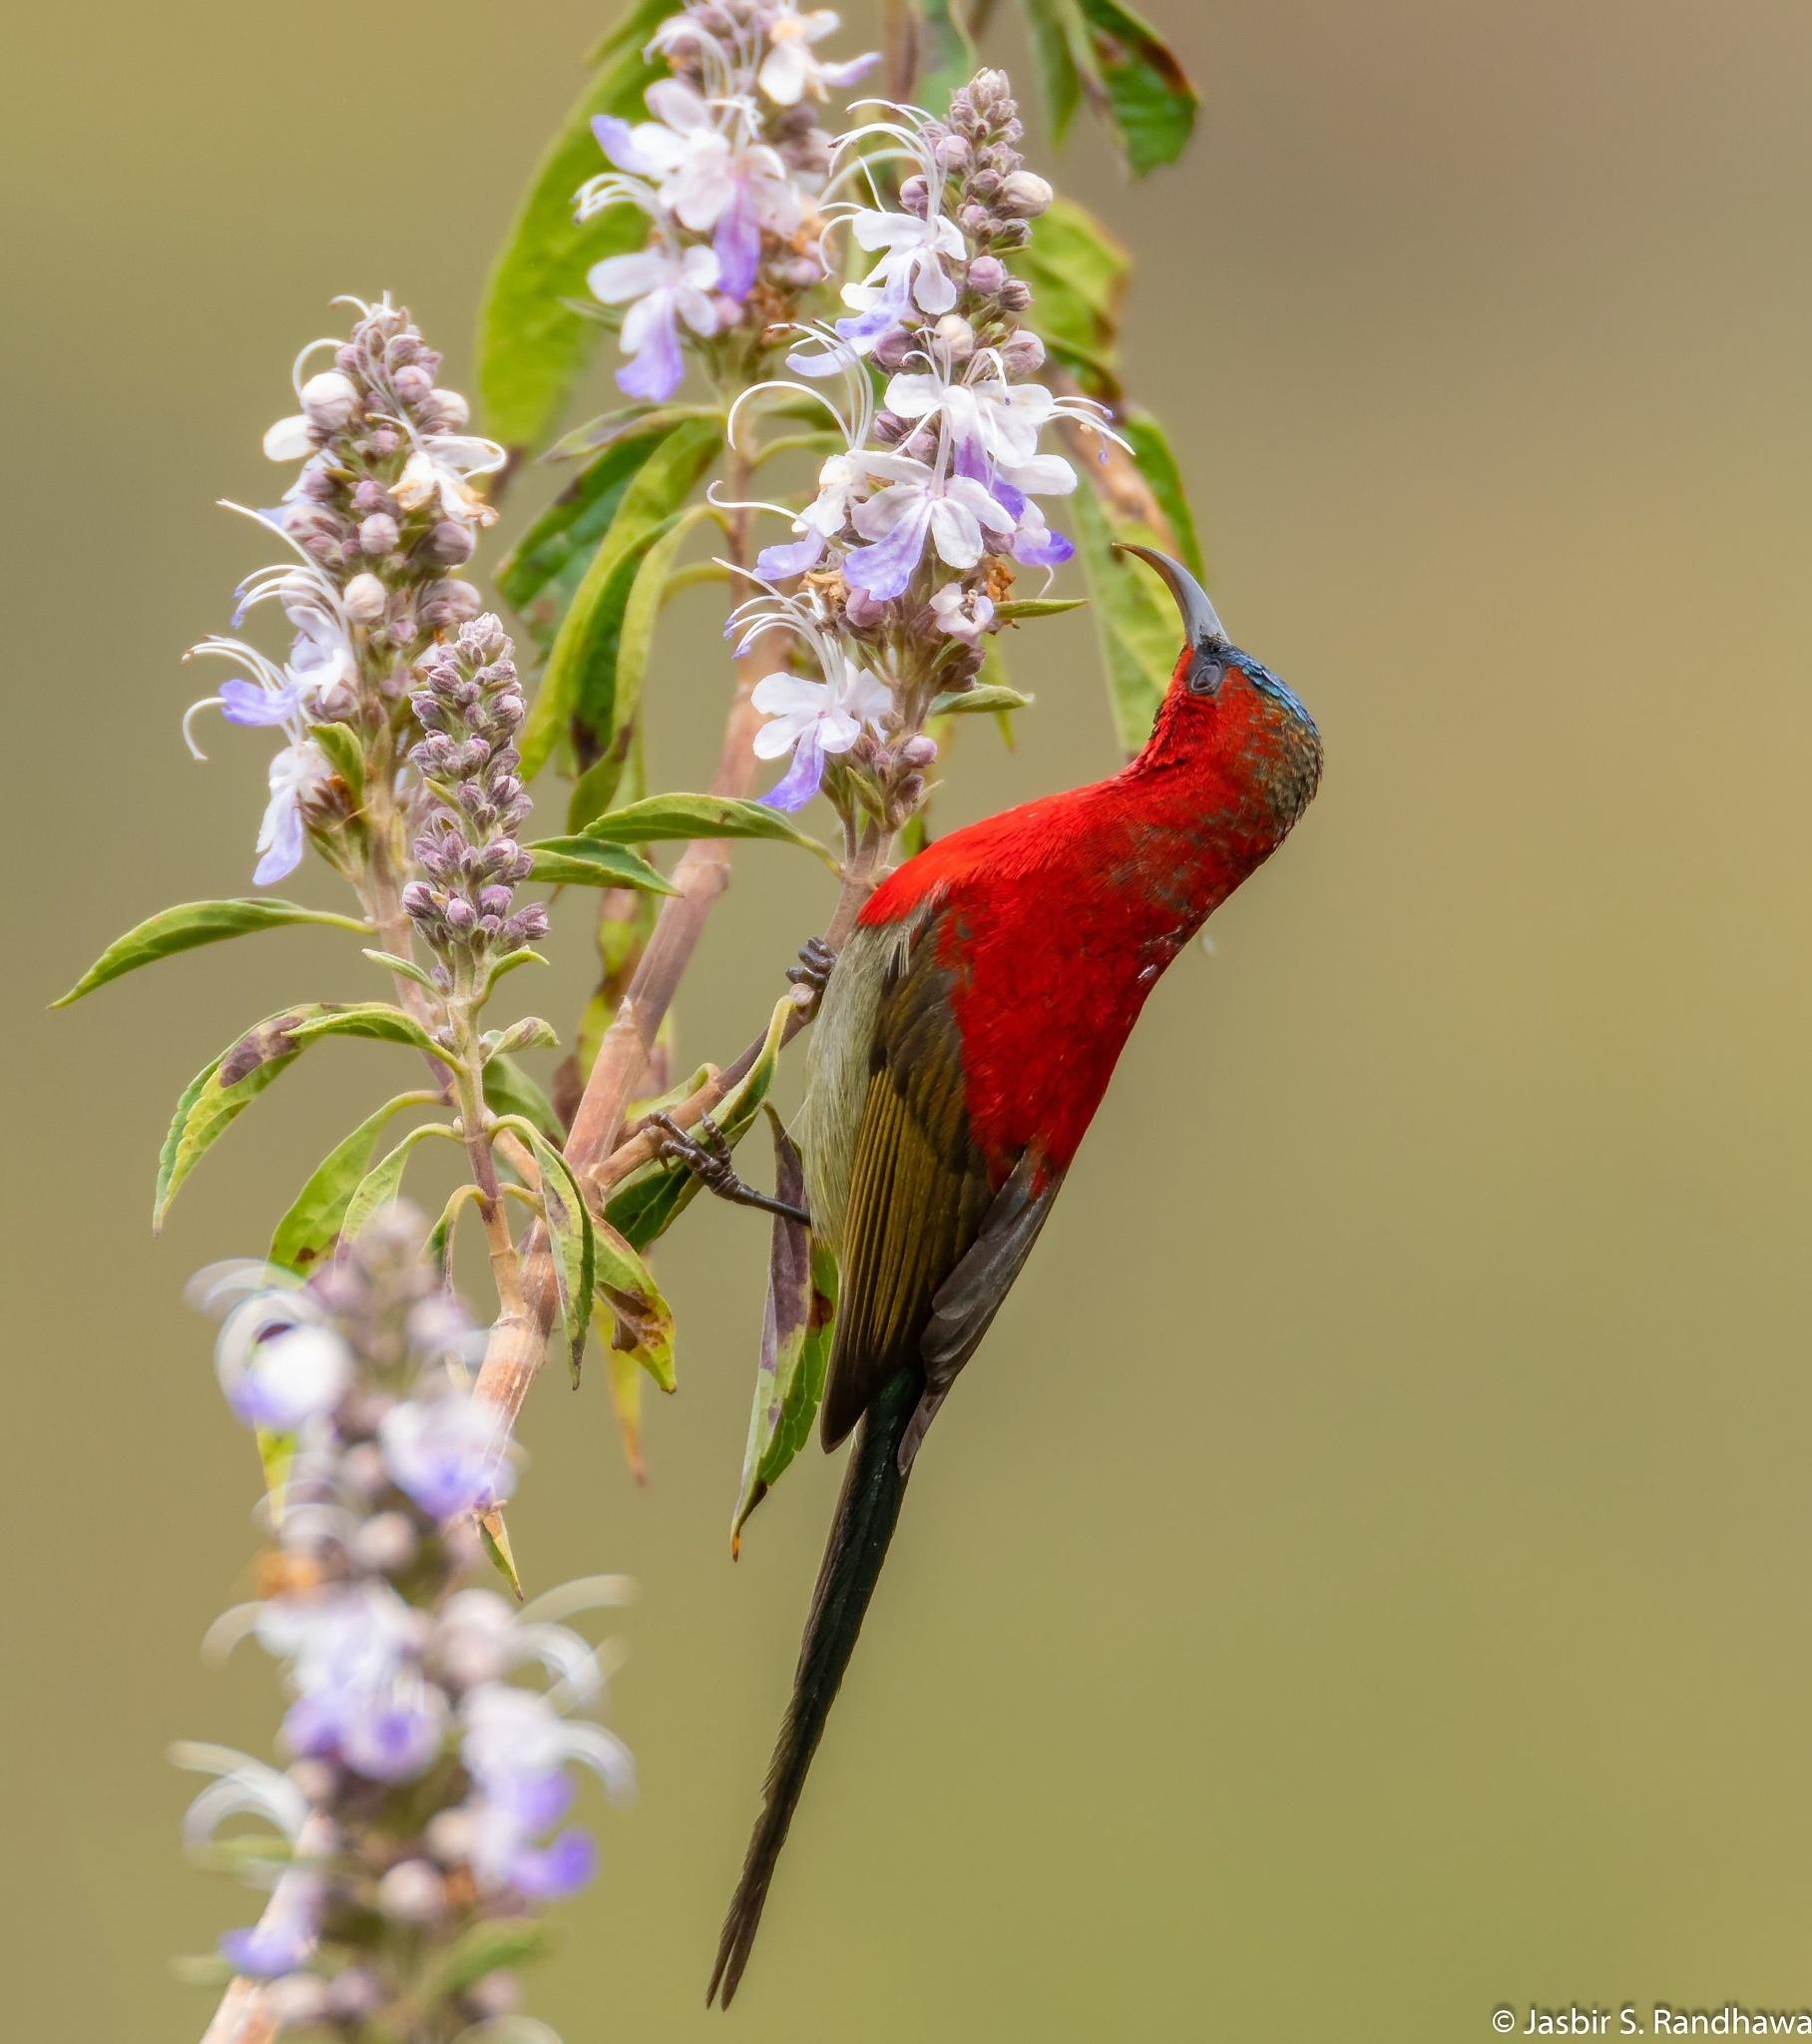 Crimson Sunbird, male (Aethopyga siparaja) by Jasbir S. Randhawa